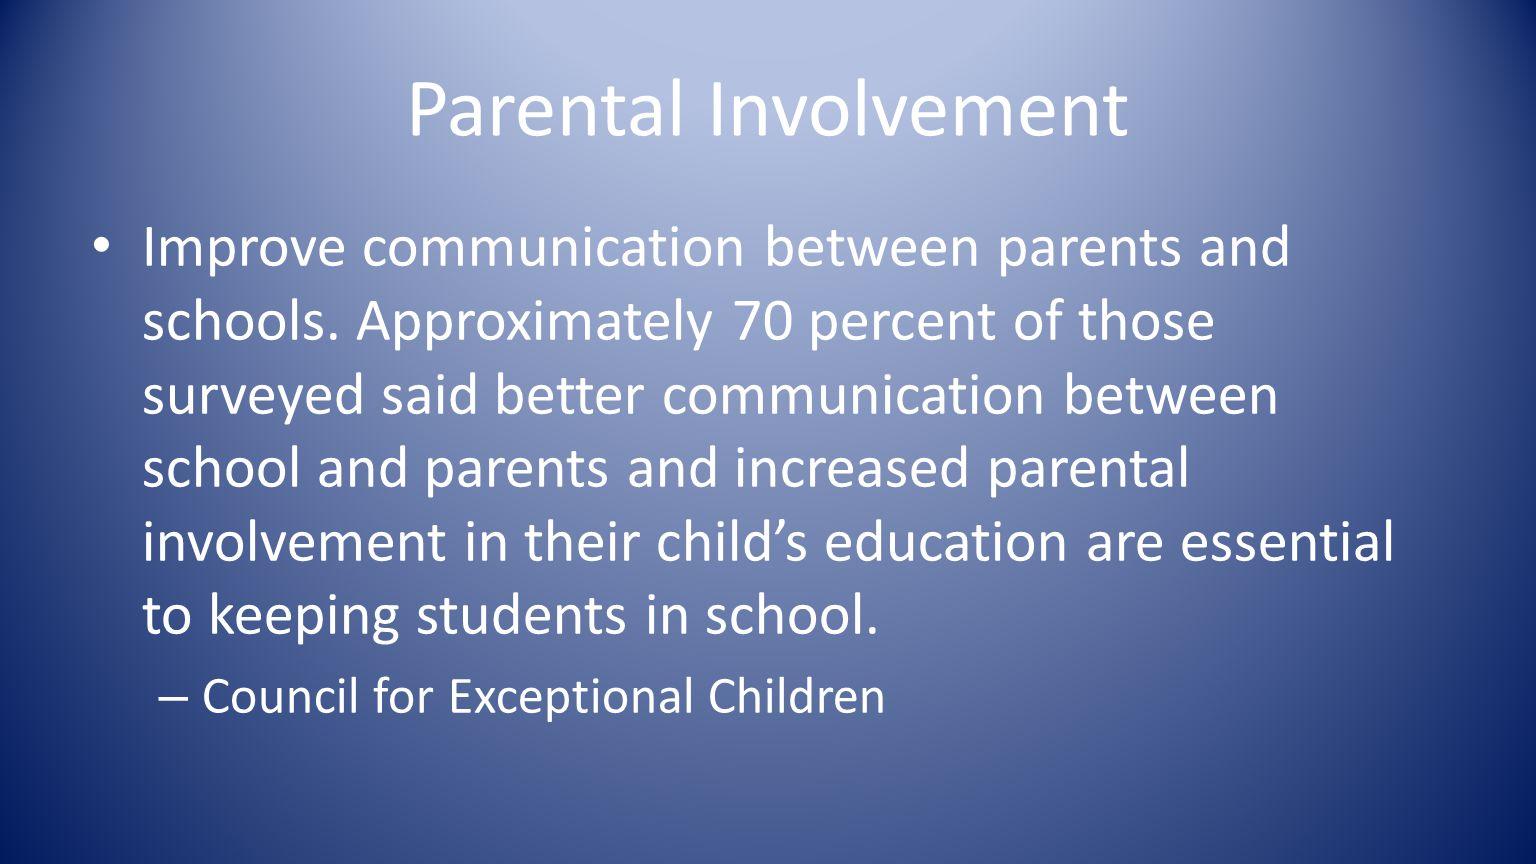 Parental Involvement Improve communication between parents and schools.